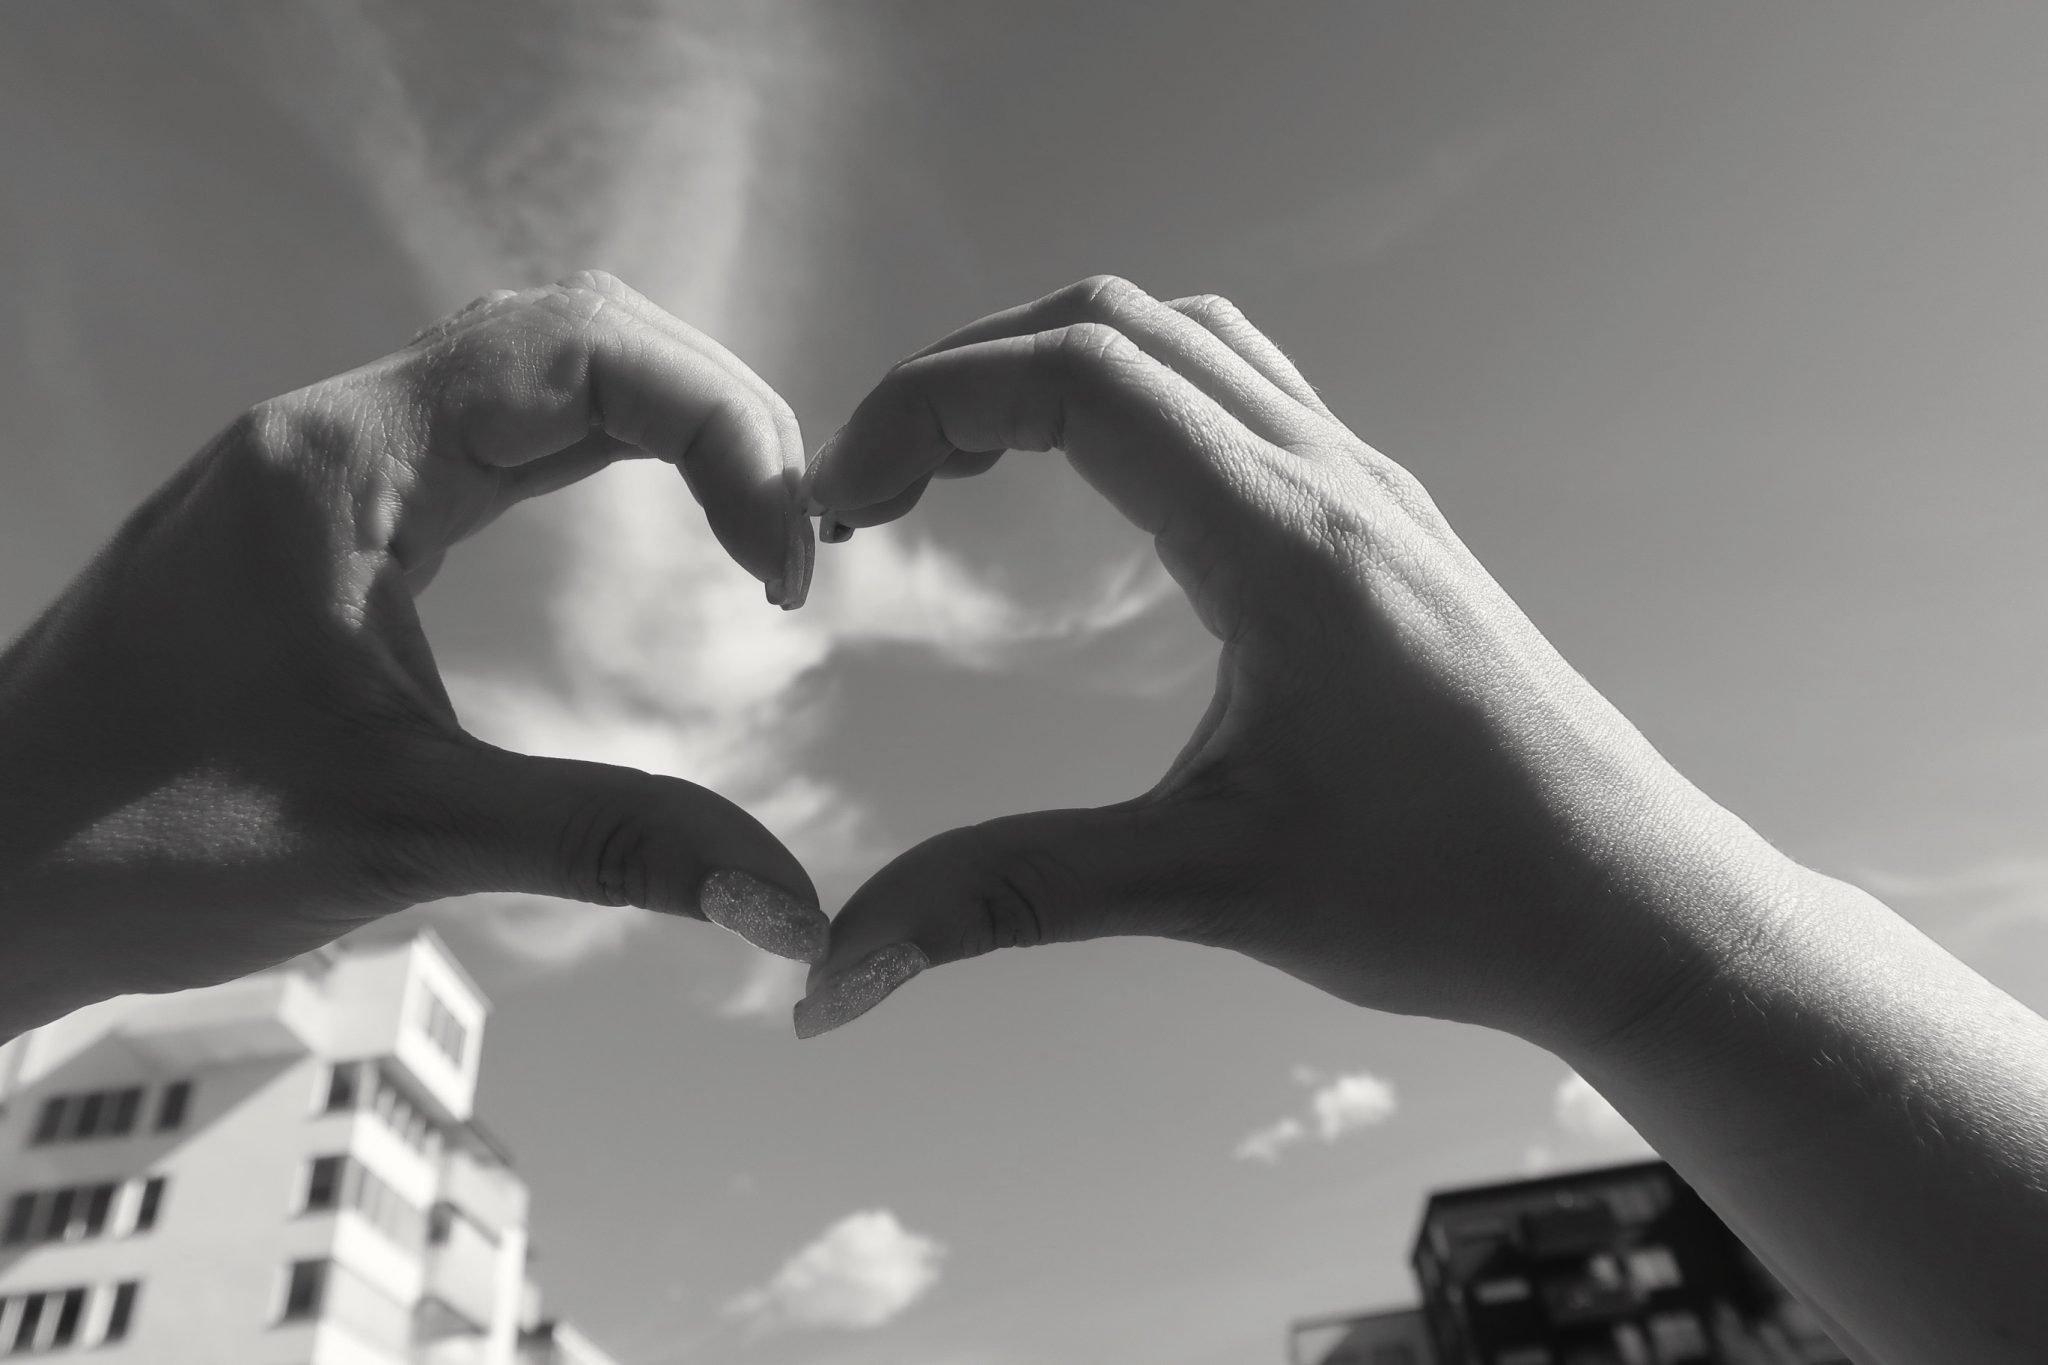 mustavalko sydän